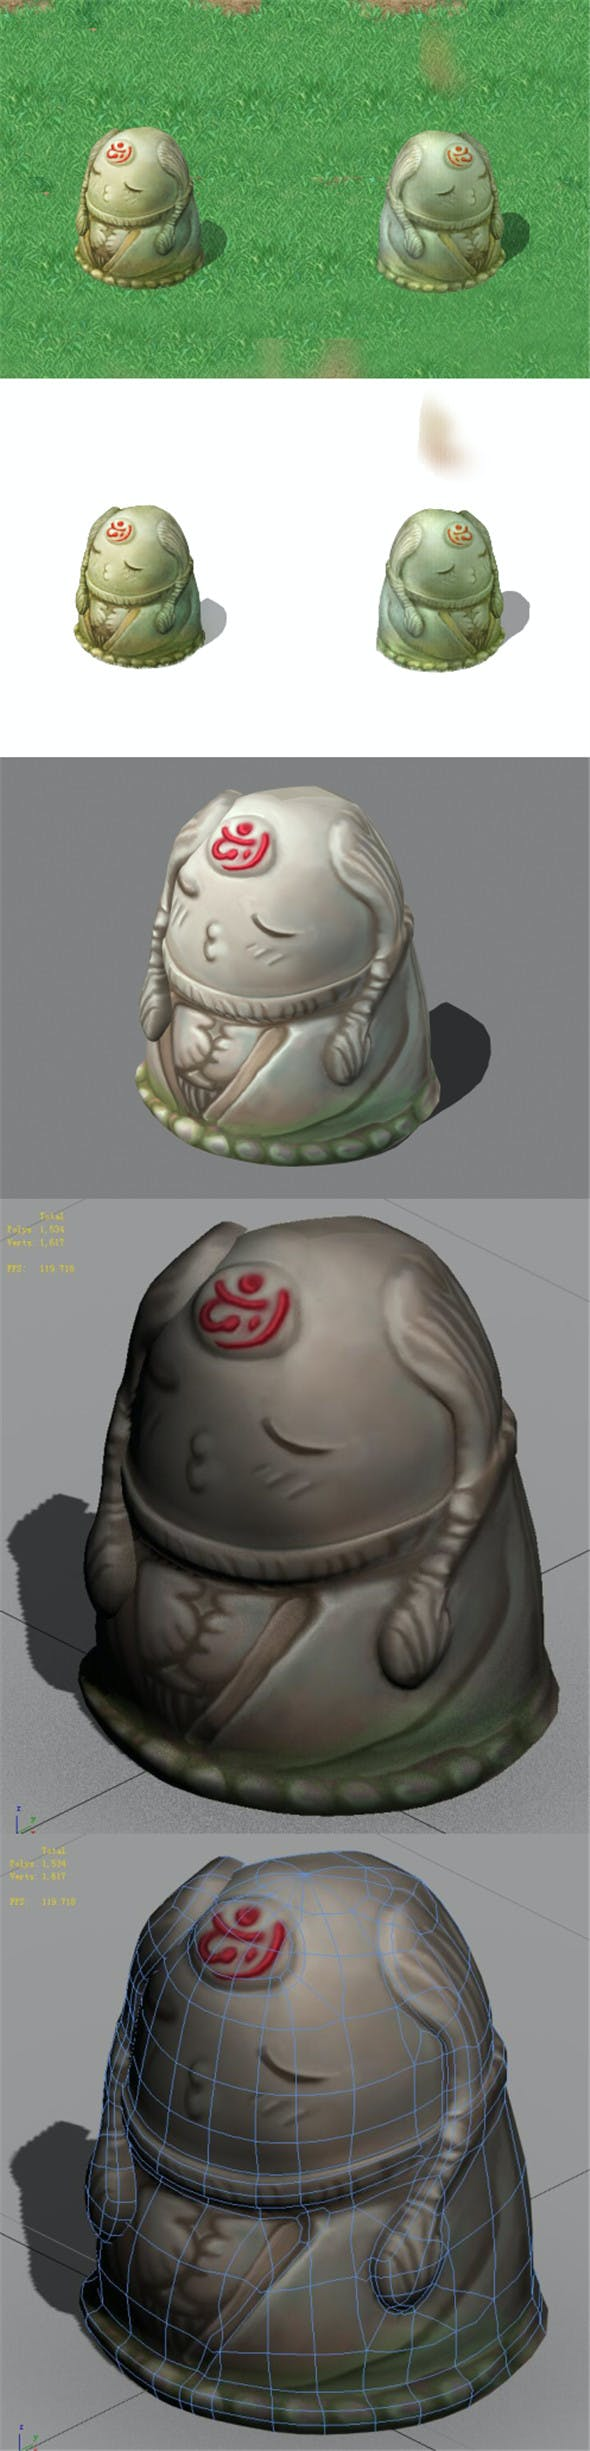 Cartoon World - Jixiang Chanting Boy 04 - 3DOcean Item for Sale